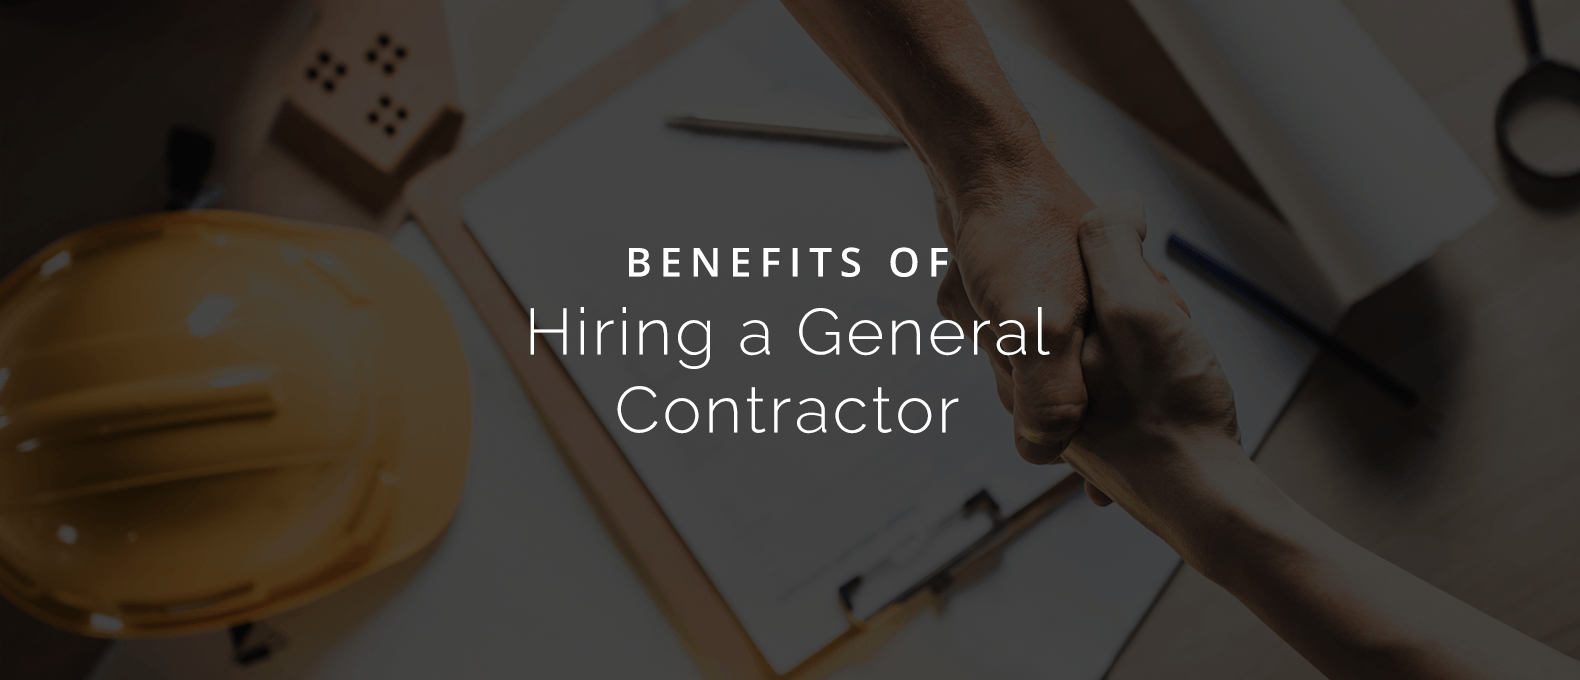 Benefits of Hiring a General Contractor